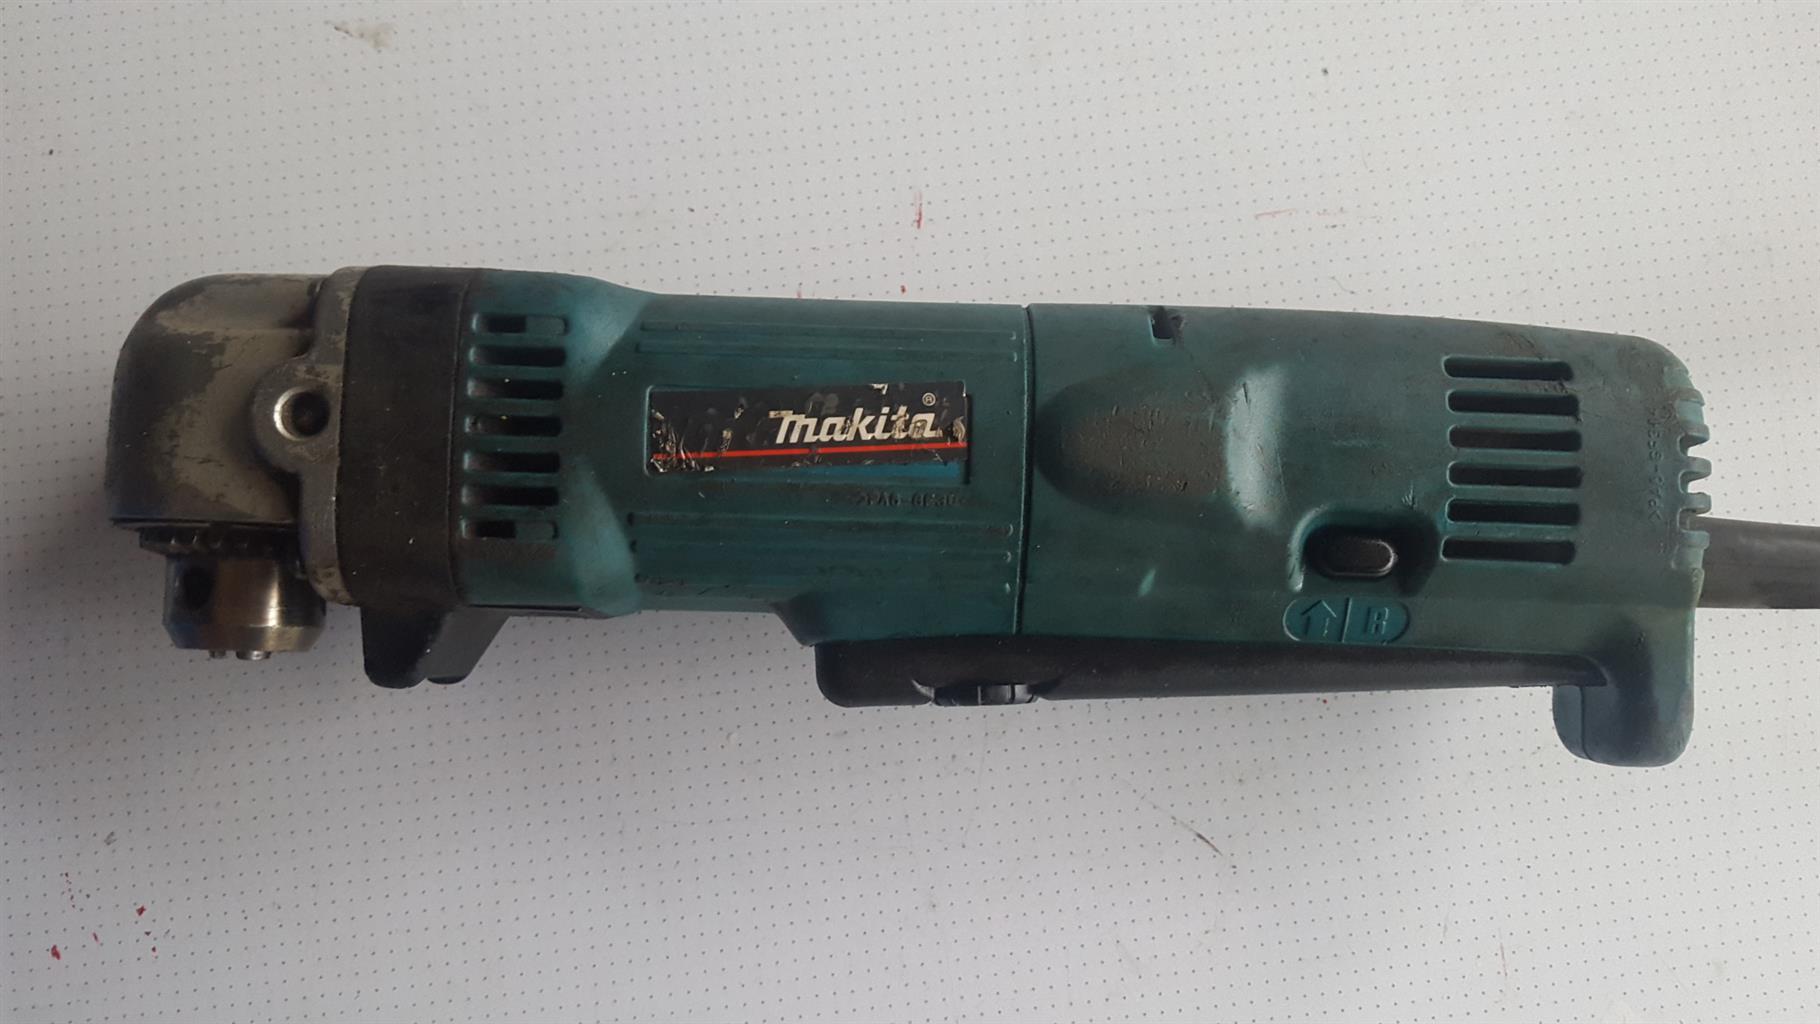 Makita Angle Rotary Drill